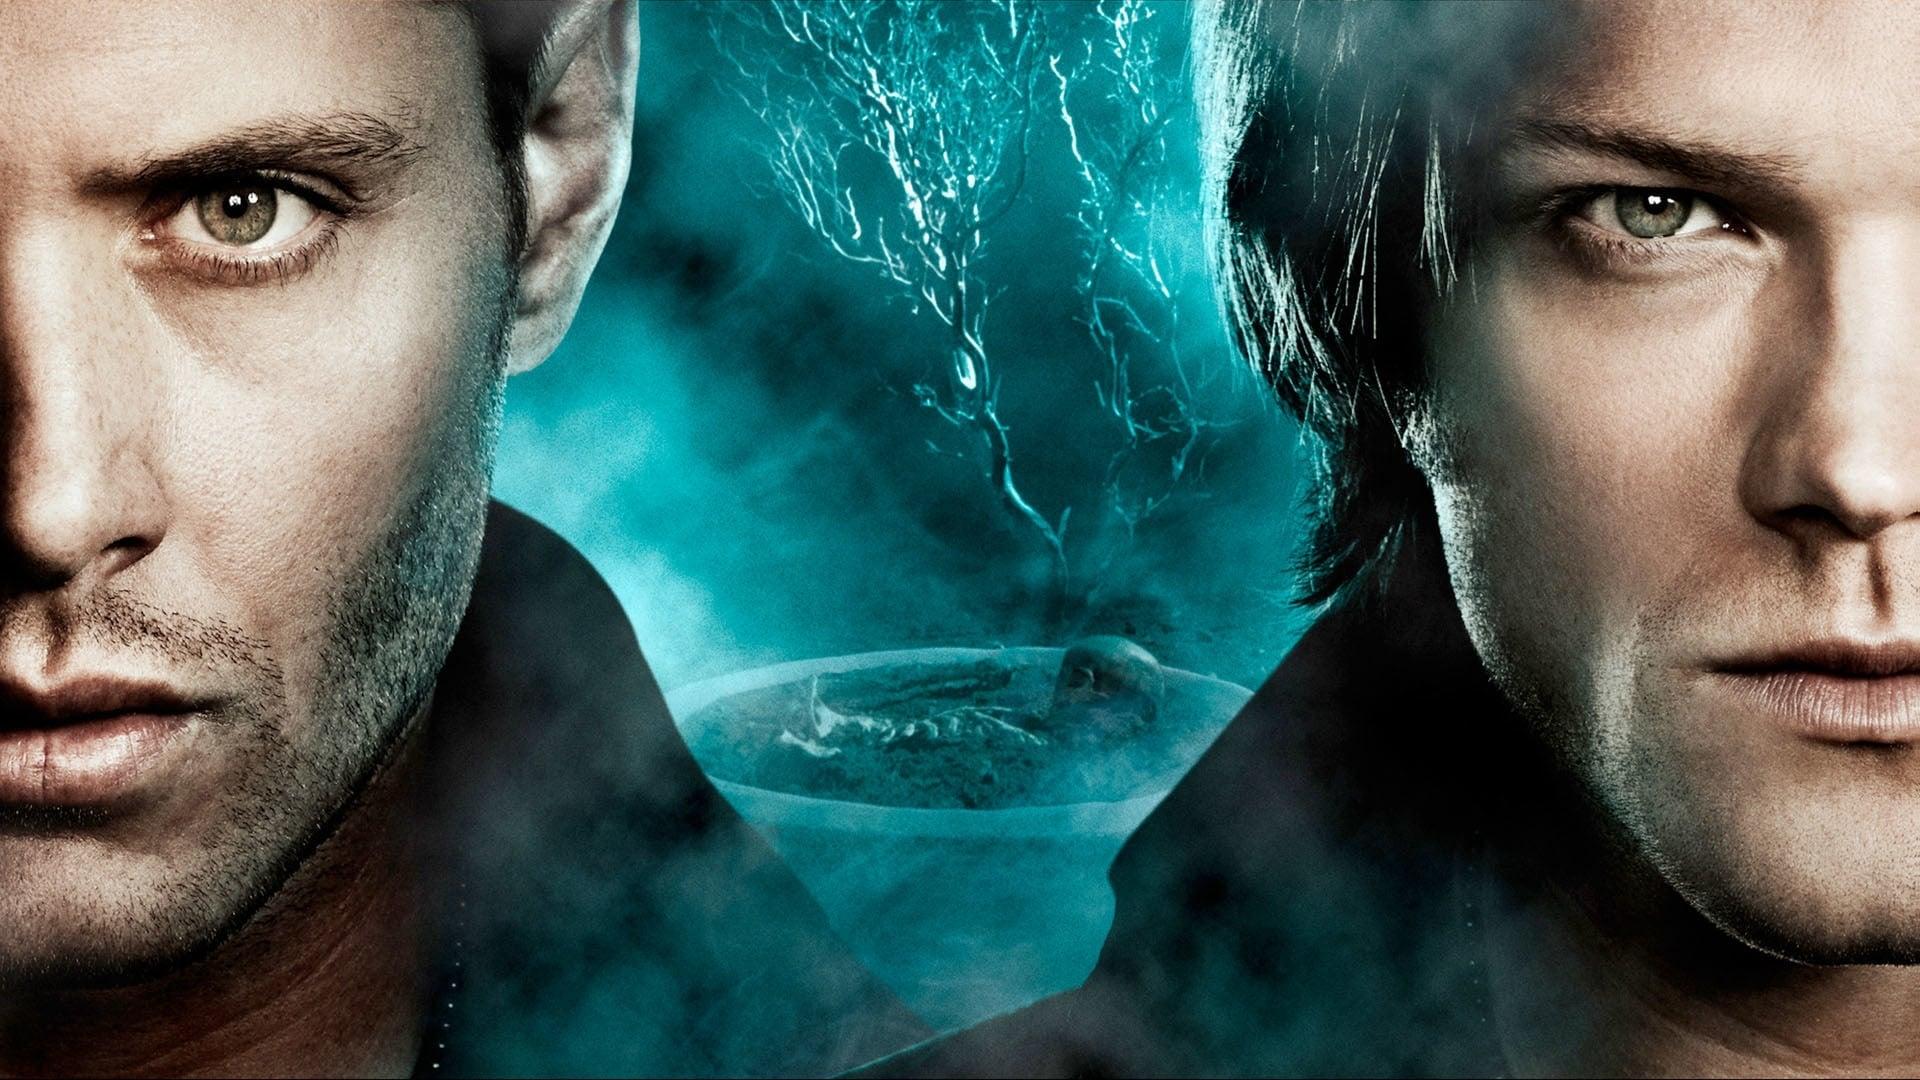 Supernatural - Season 14 Episode 4 Mint Condition